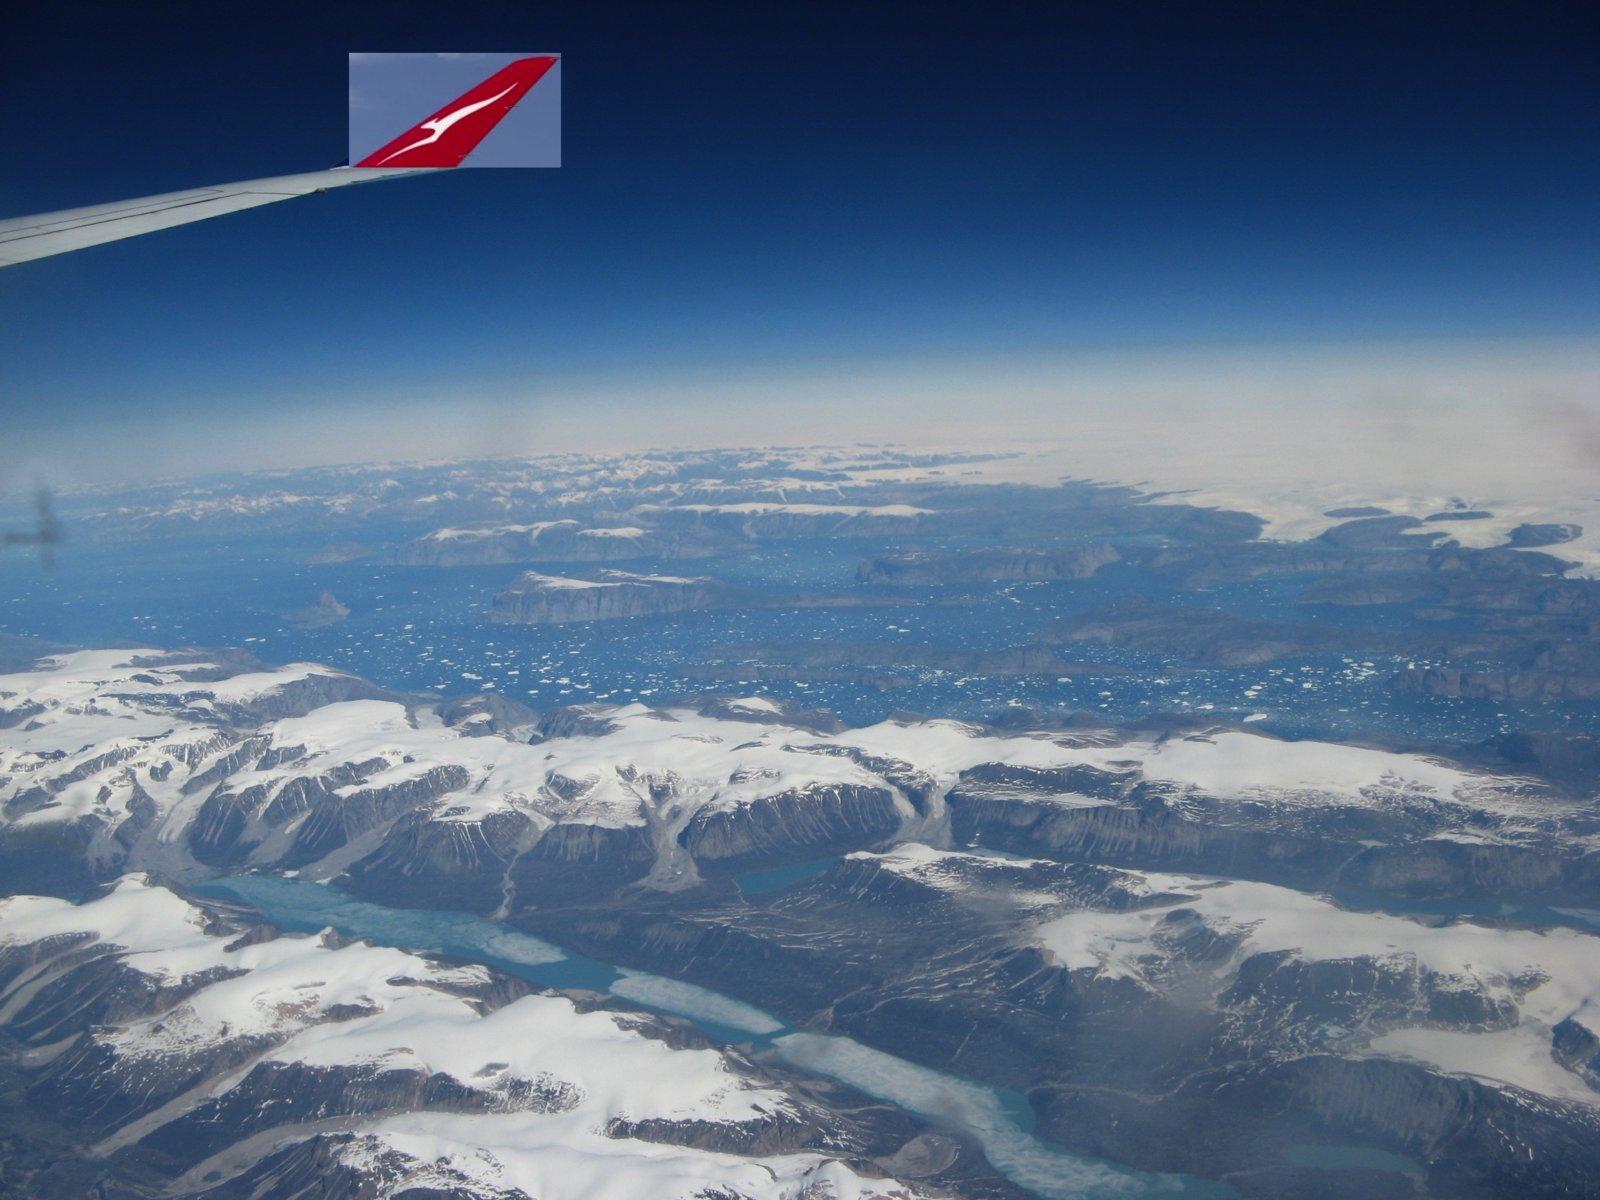 Qantas over Greenland.